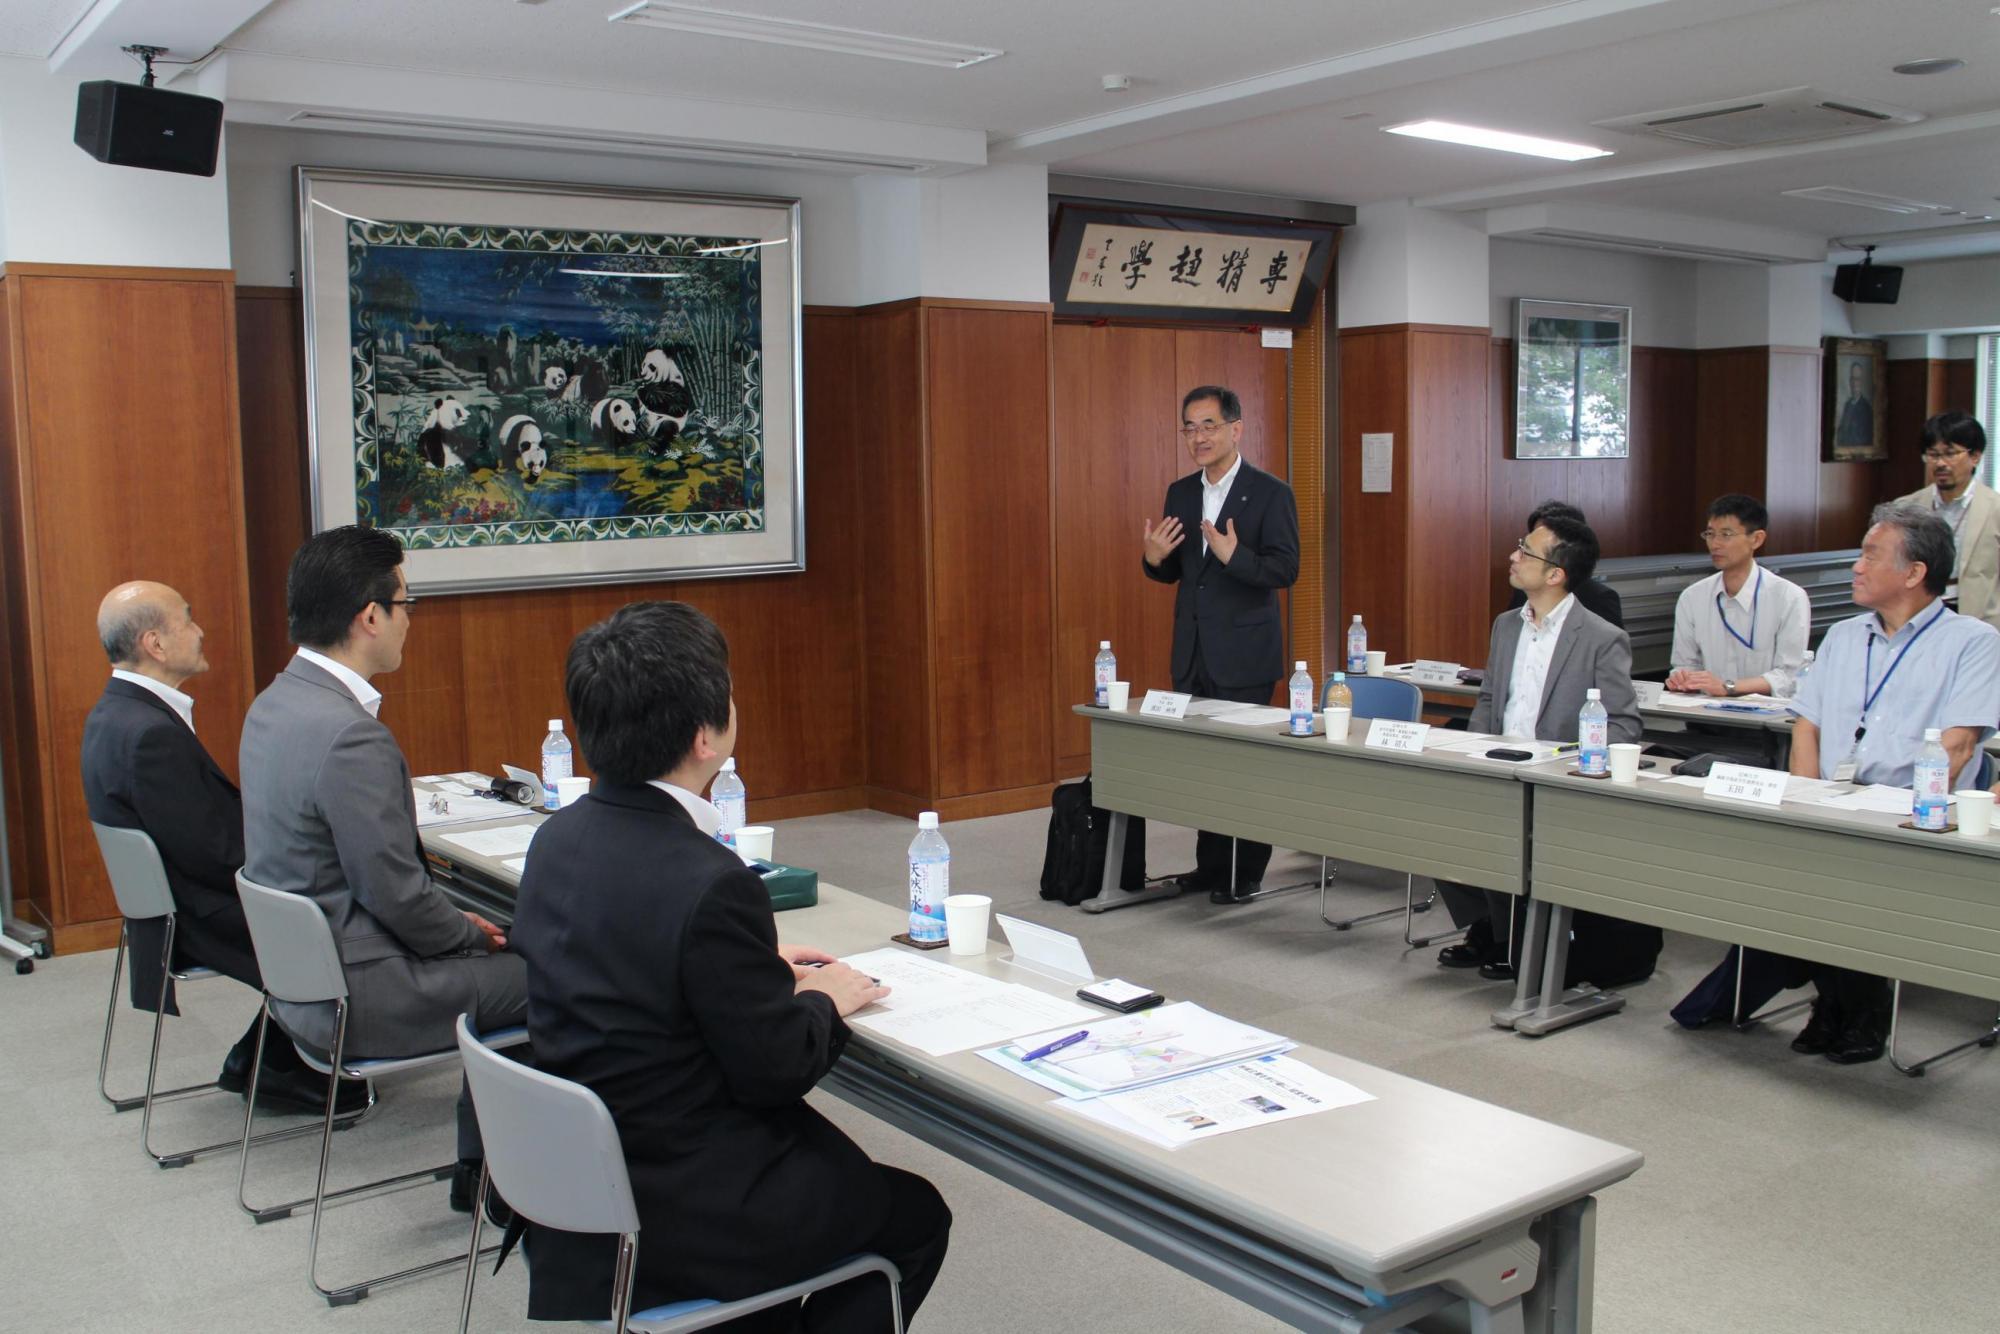 http://www.shinshu-u.ac.jp/project/leading/news/20190729%20conference.JPG